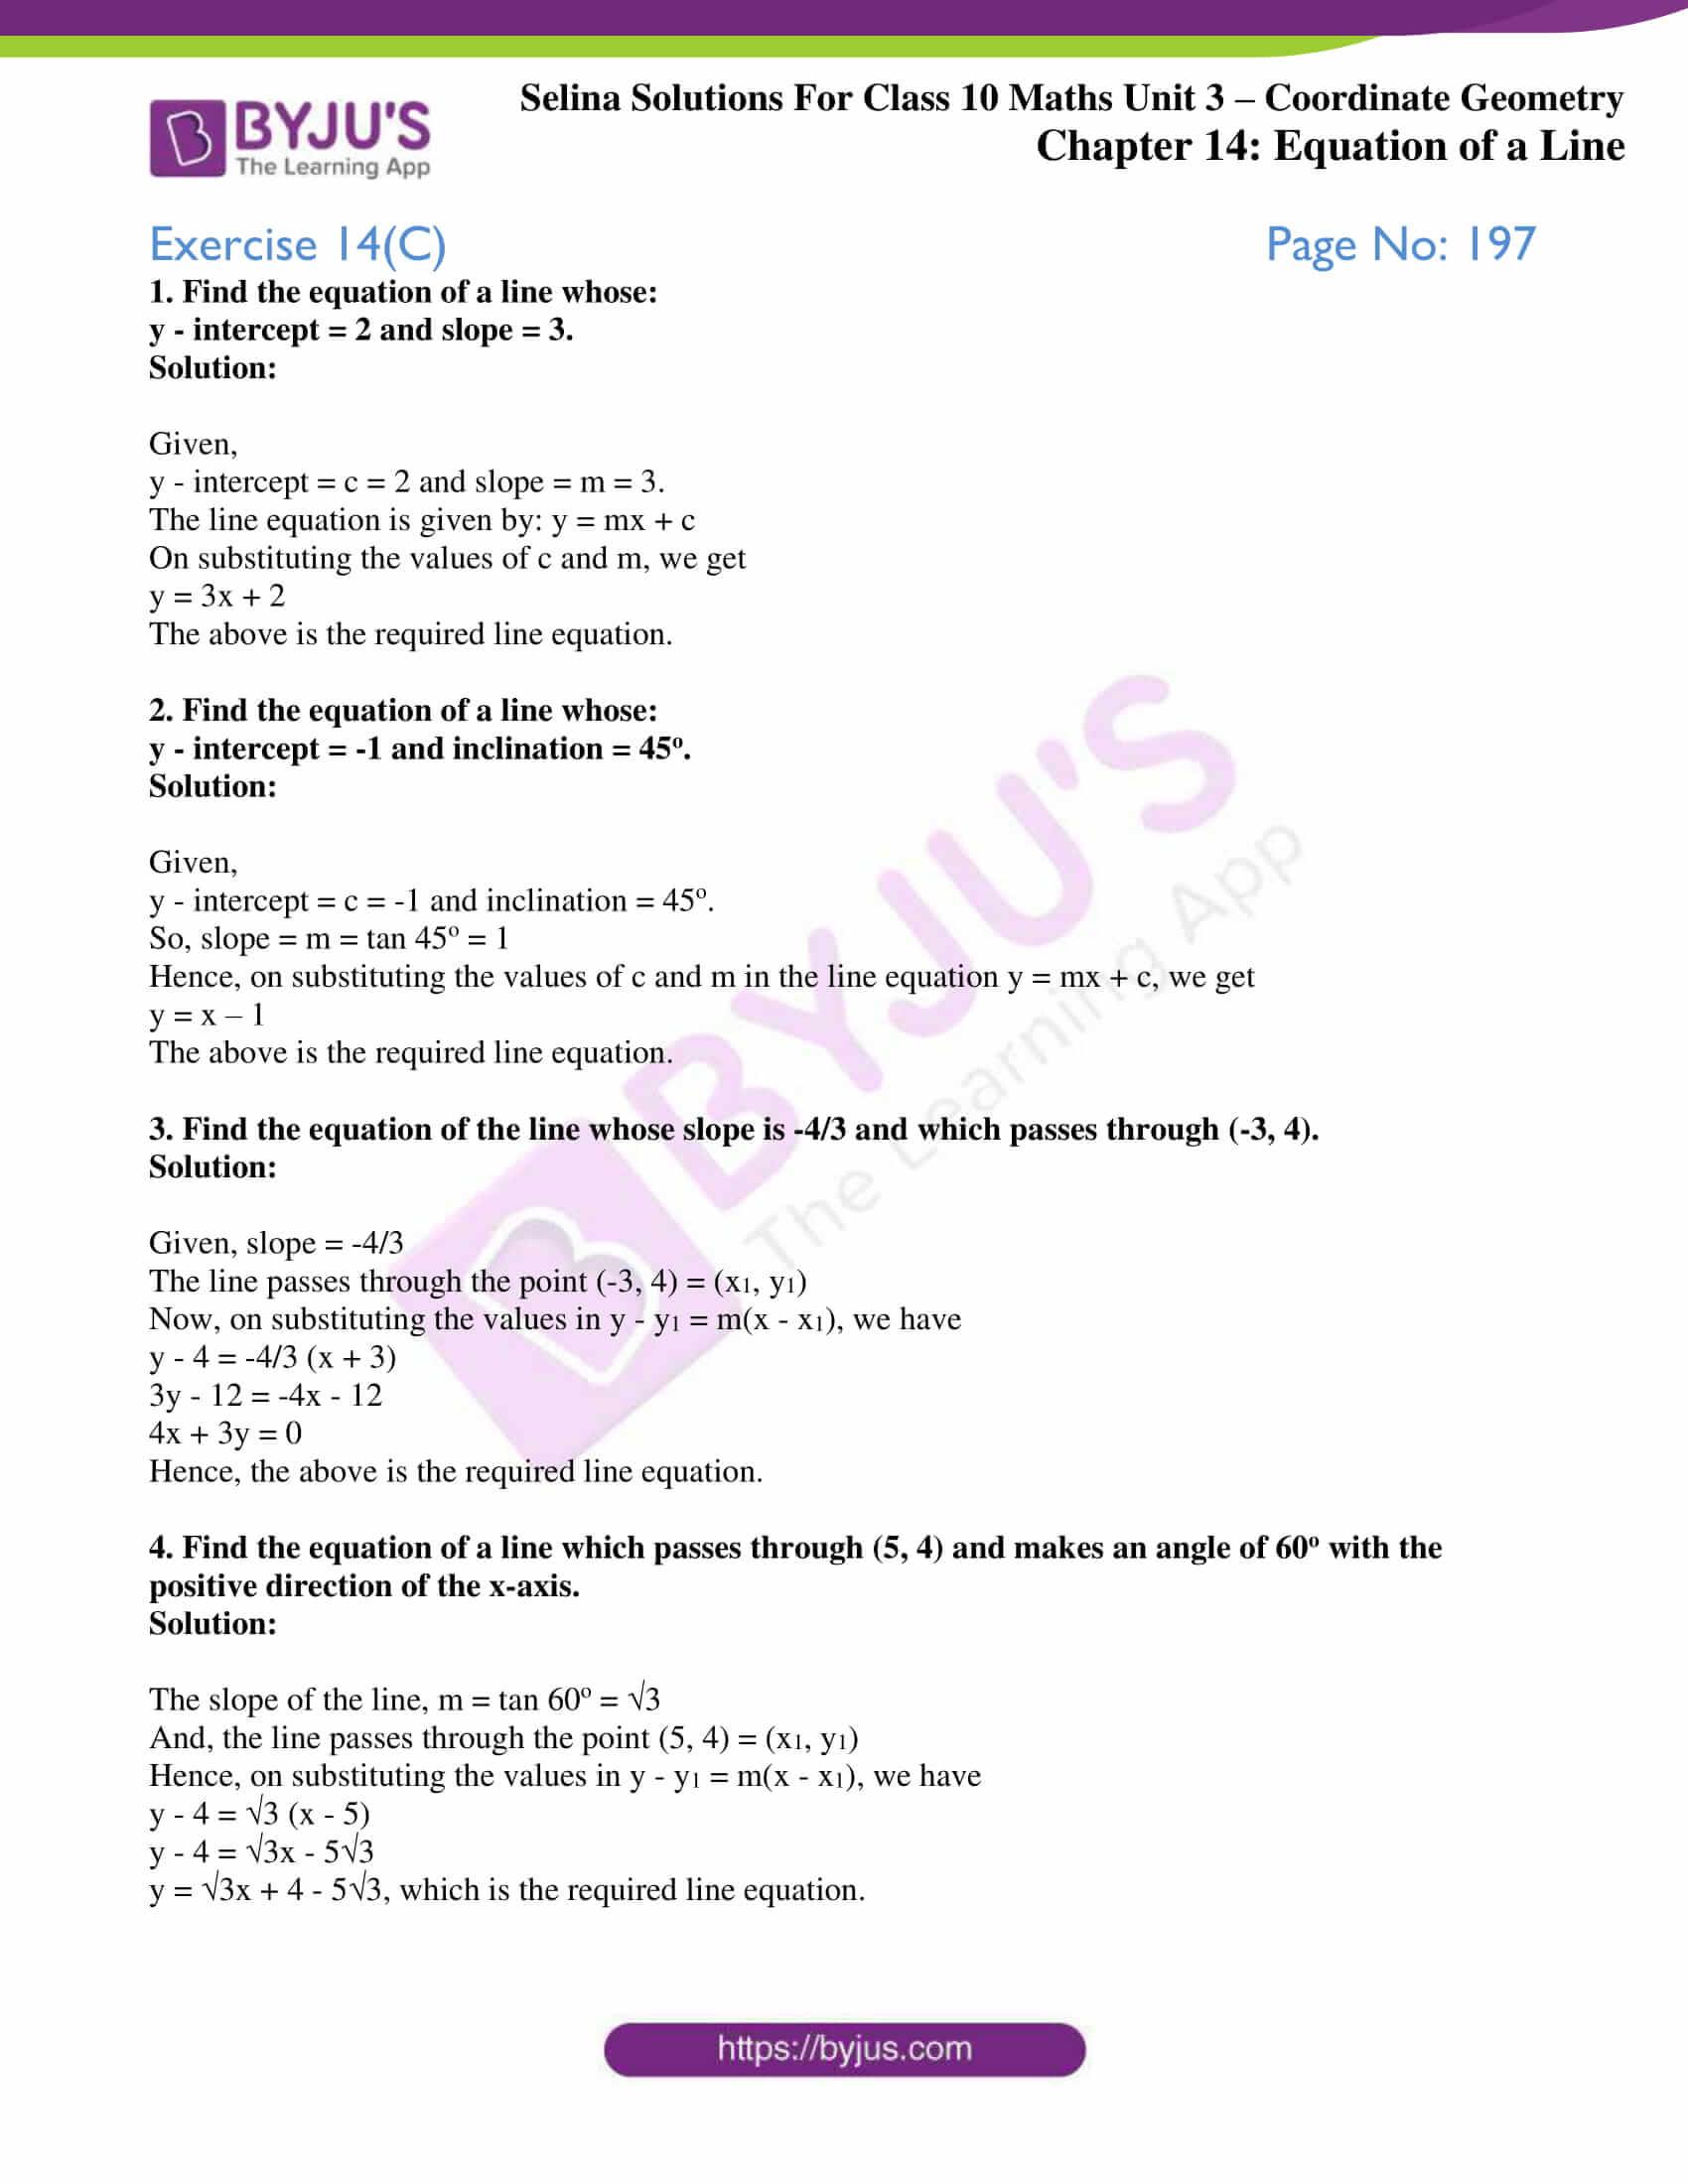 selina-sol-maths-class-10-ch-14-ex-c-1